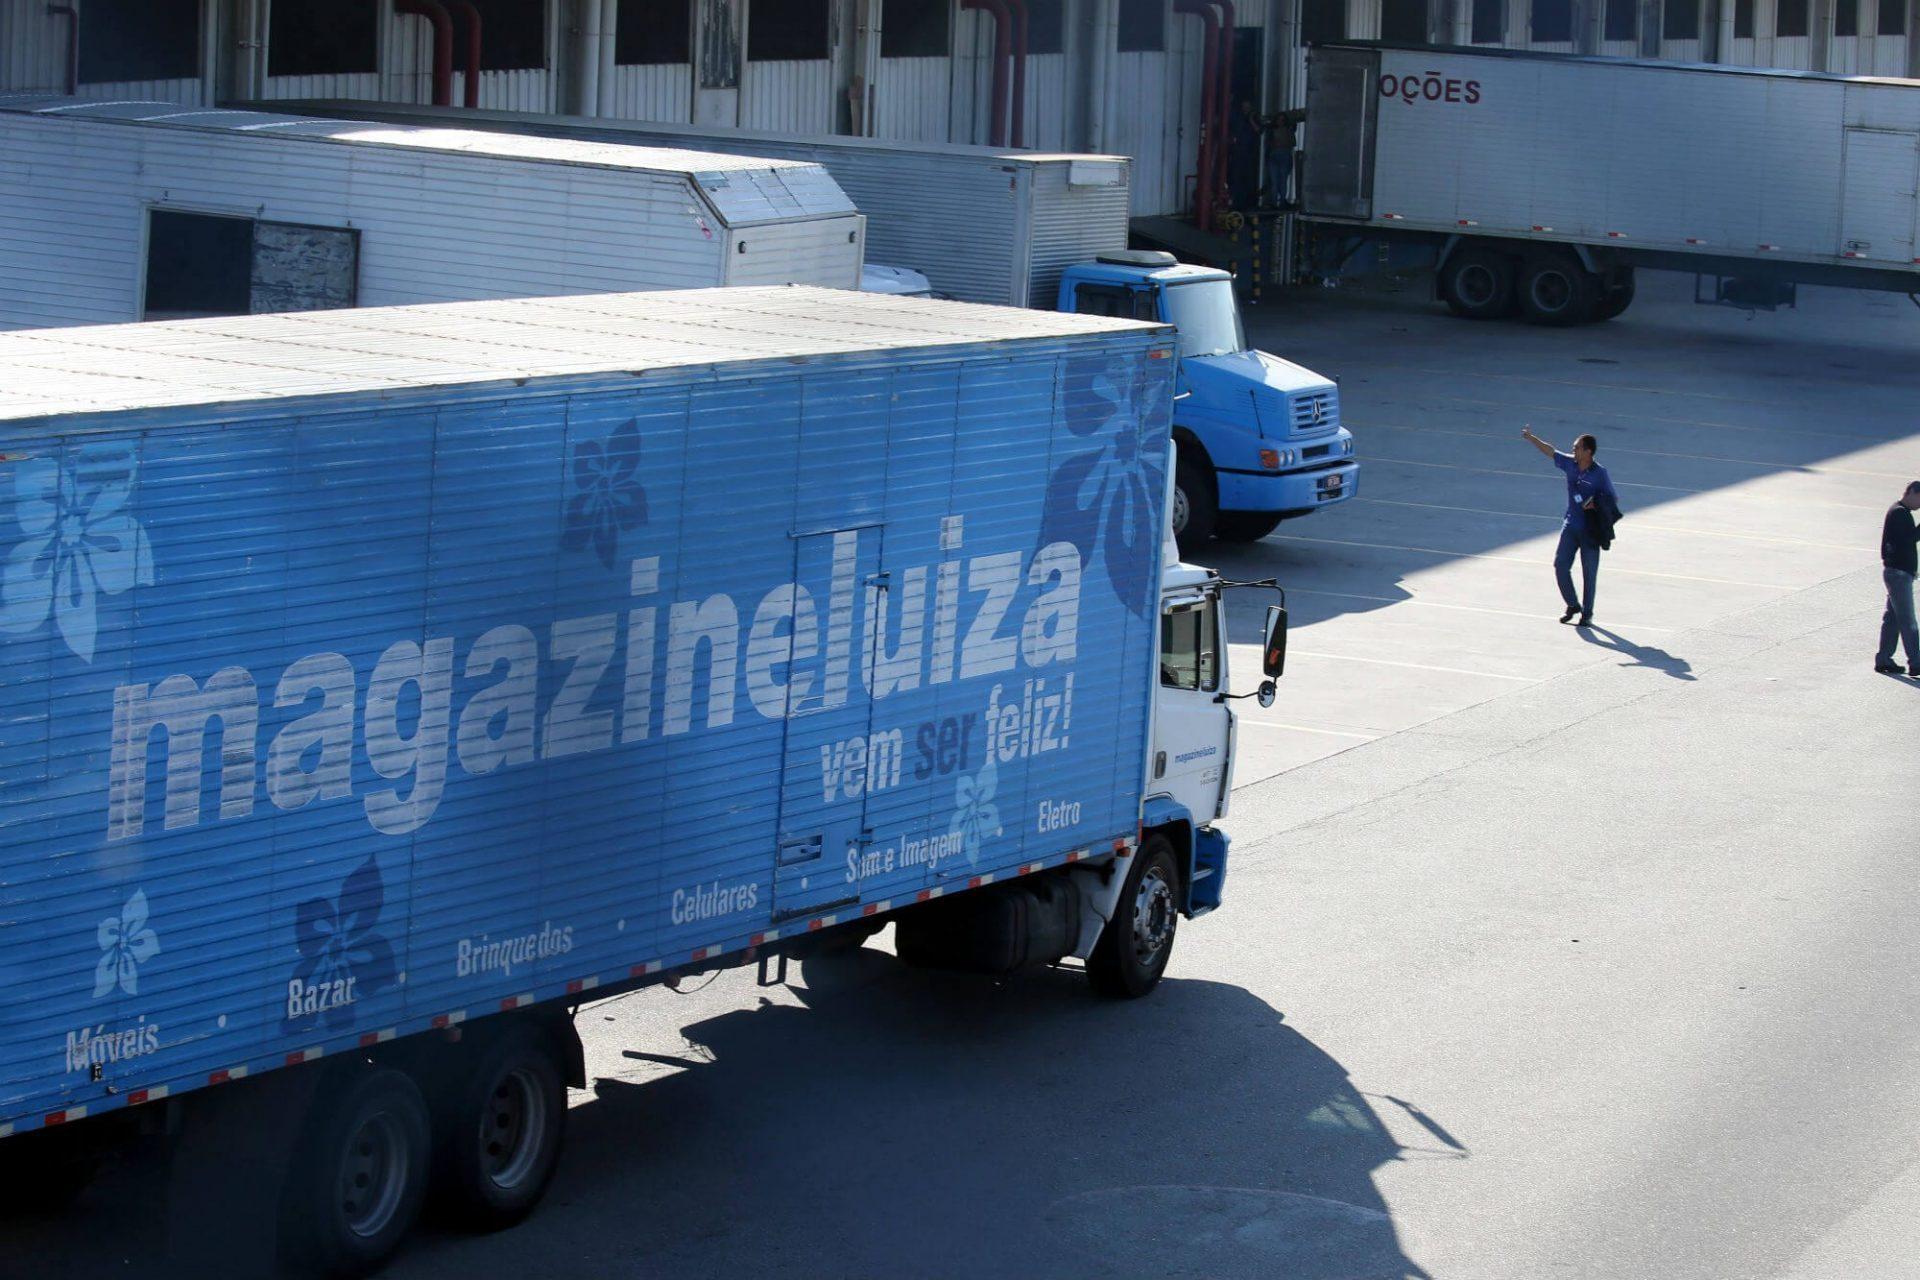 Negocios magazine luiza 020519 reuters